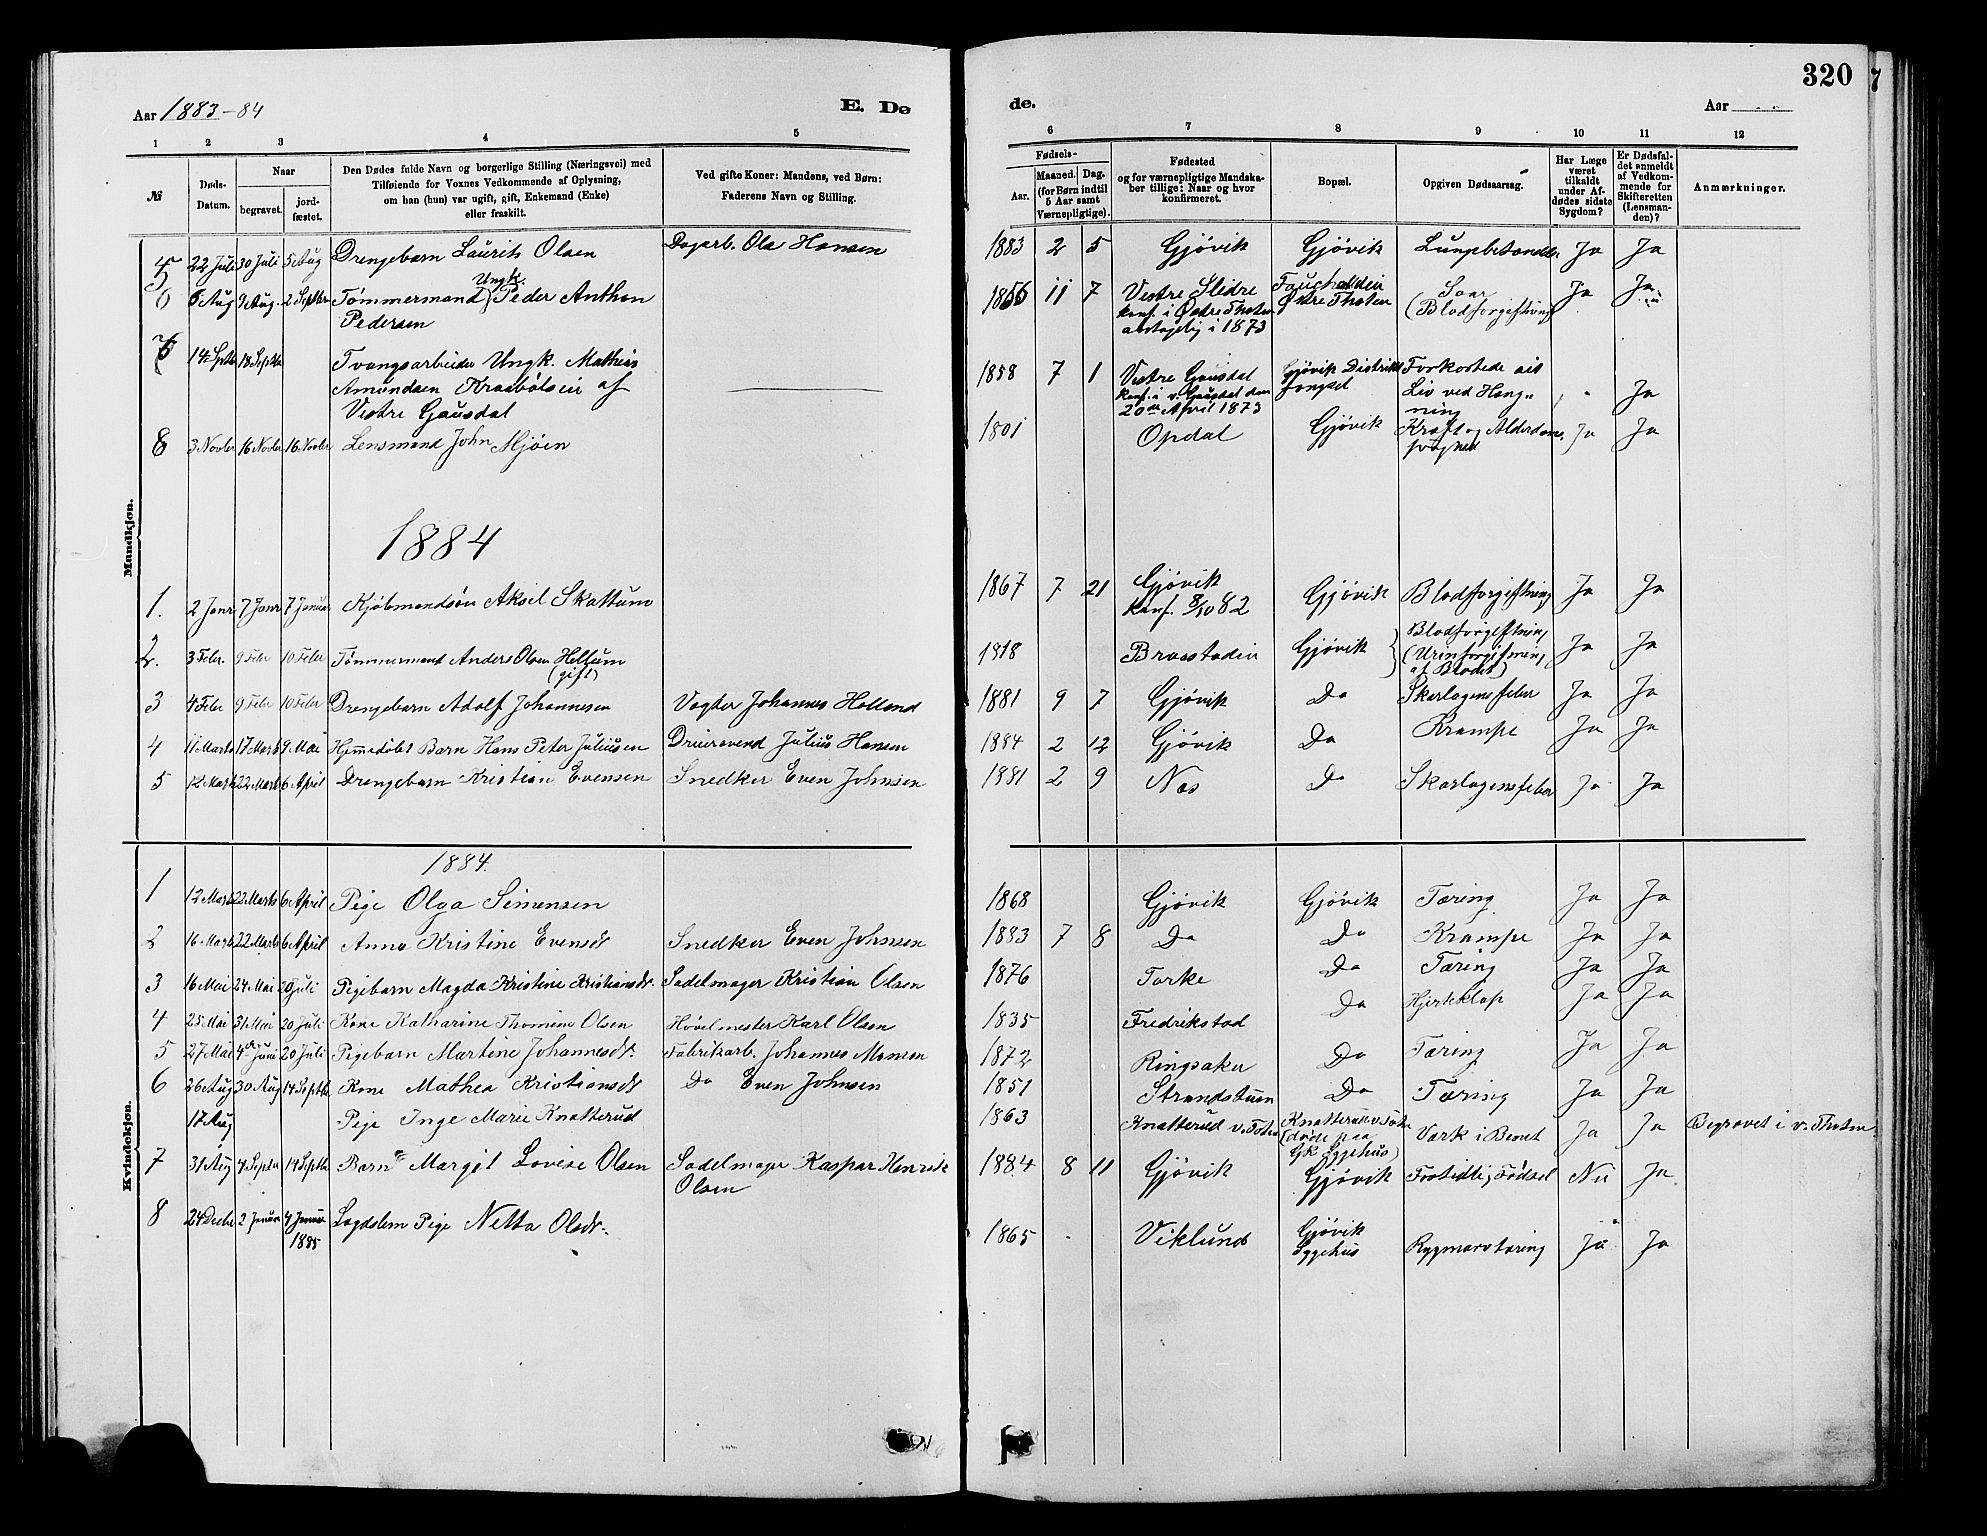 SAH, Vardal prestekontor, H/Ha/Hab/L0007: Klokkerbok nr. 7 /2, 1881-1895, s. 320